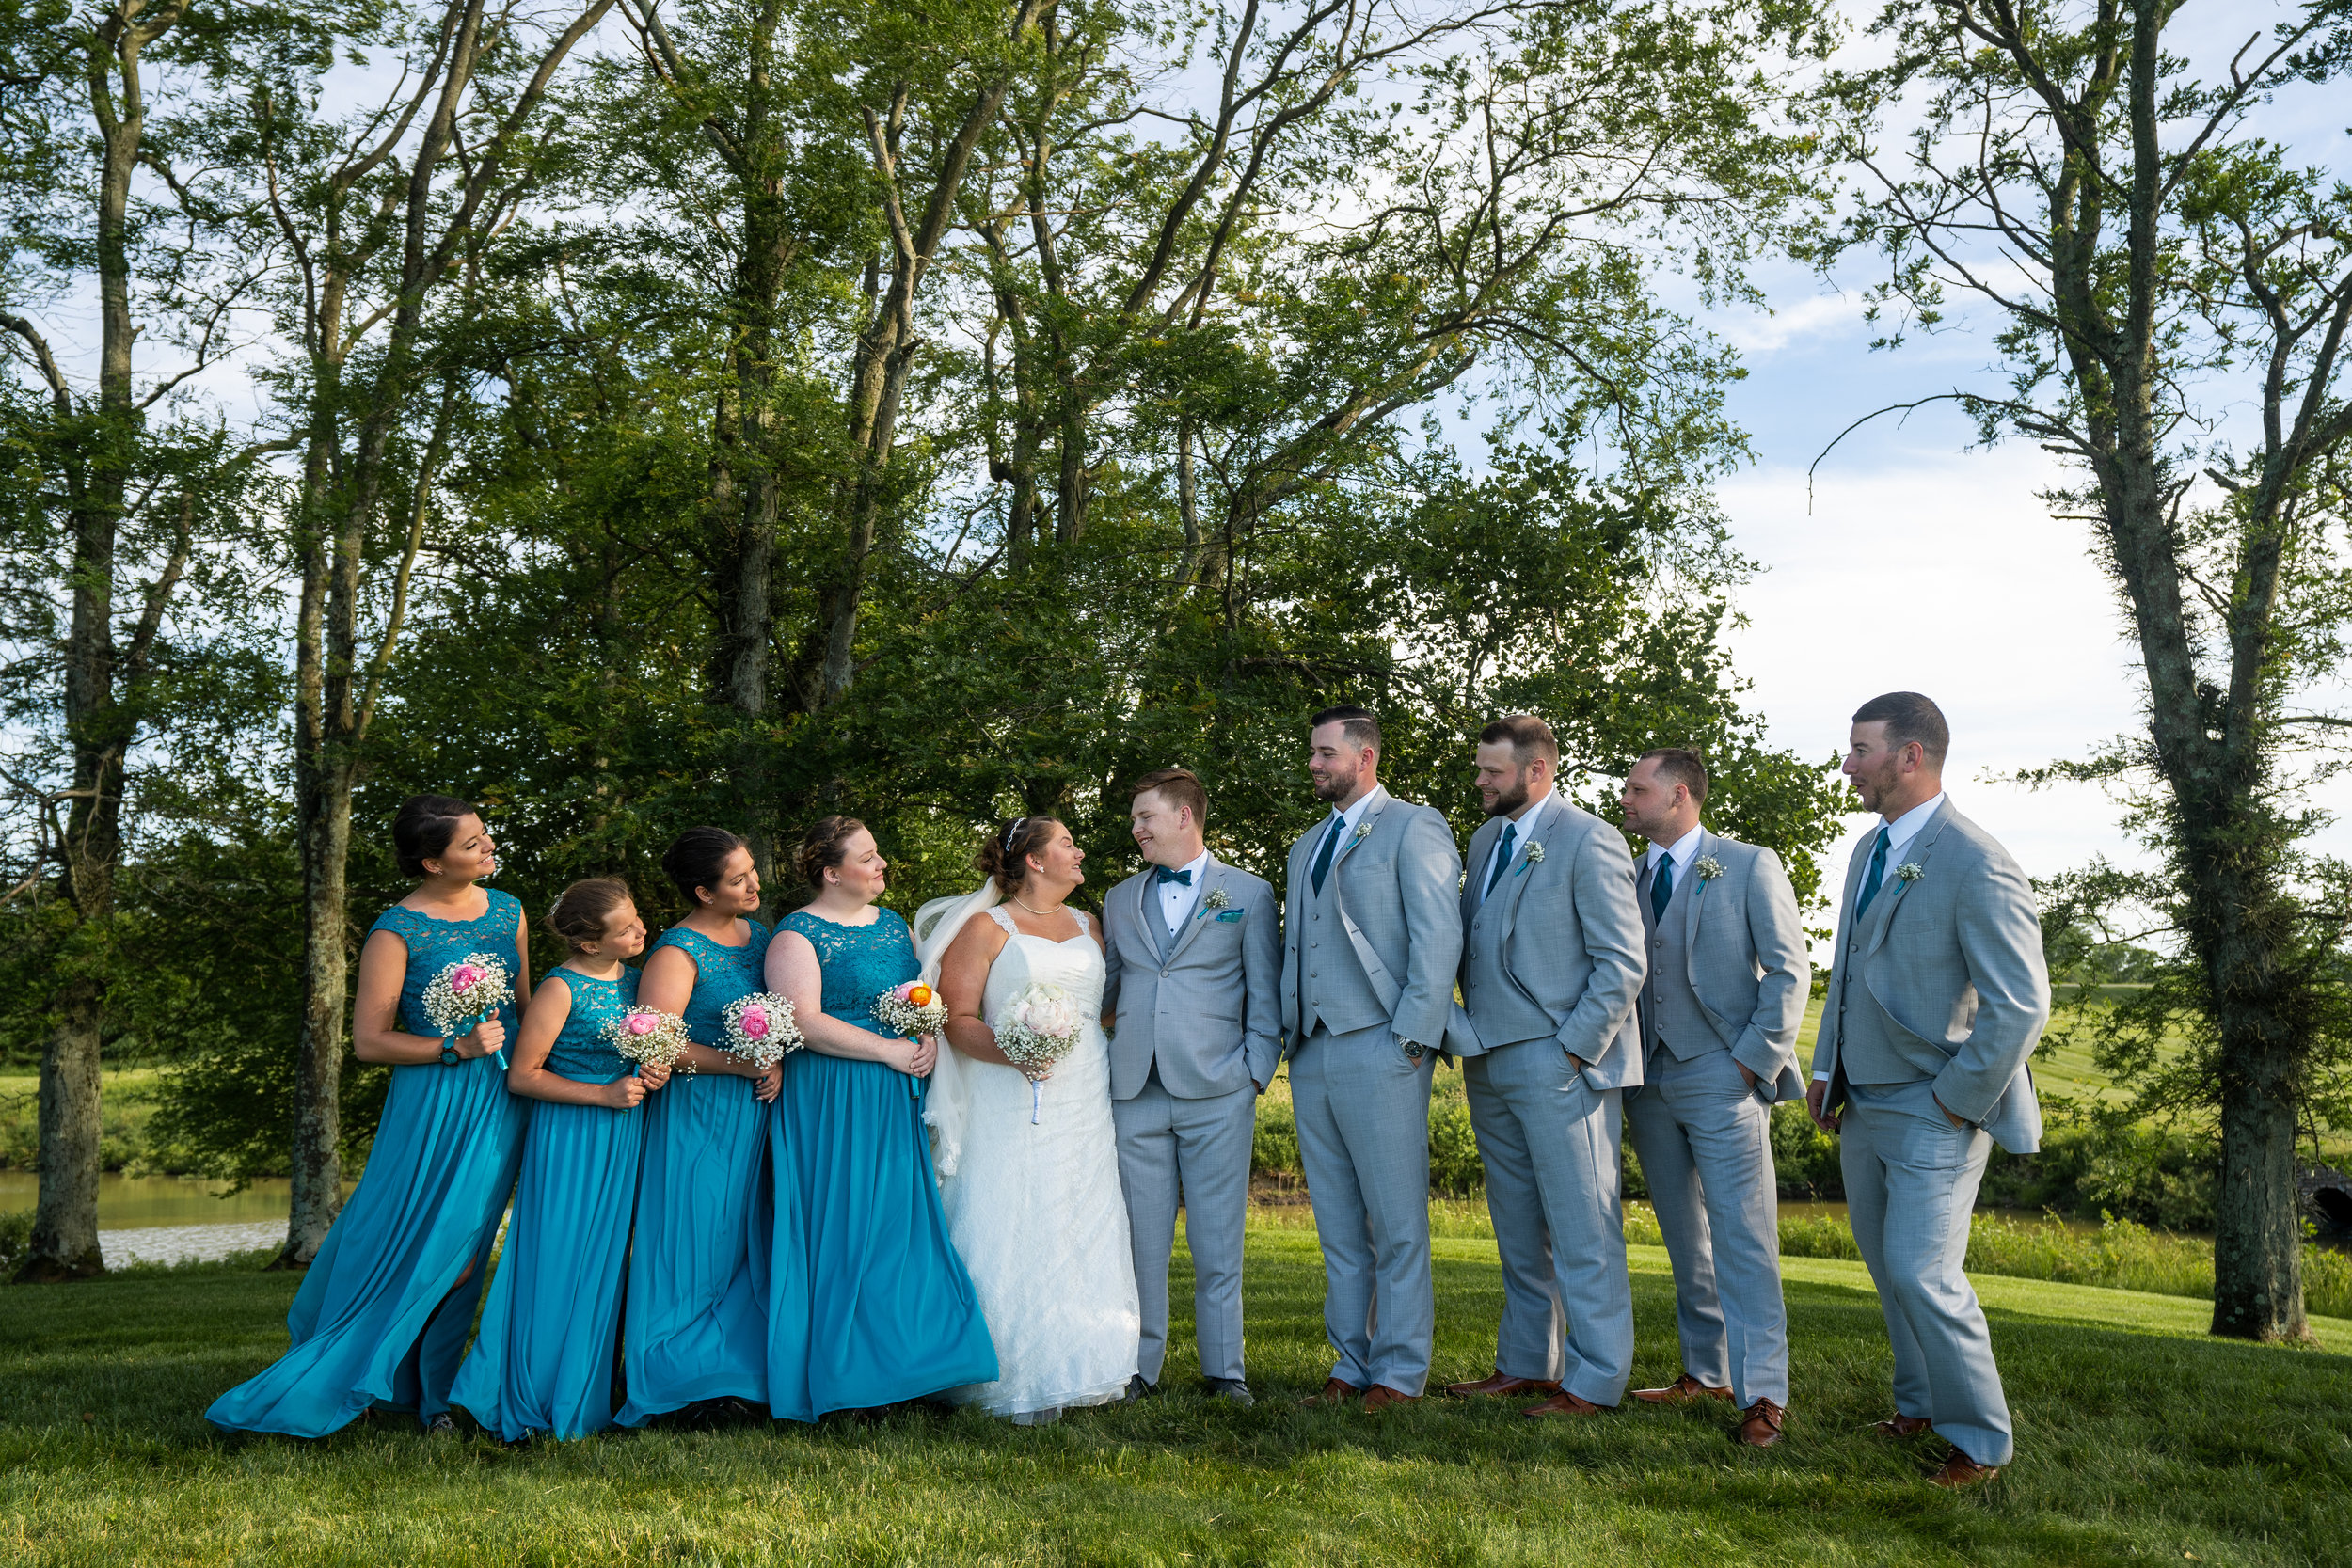 Bear Creative Co, Columbus Ohio Photographer, Columbus Ohio Wedding Photographer, NorthStar Golf Club, Columbus Ohio, Destination Photographer